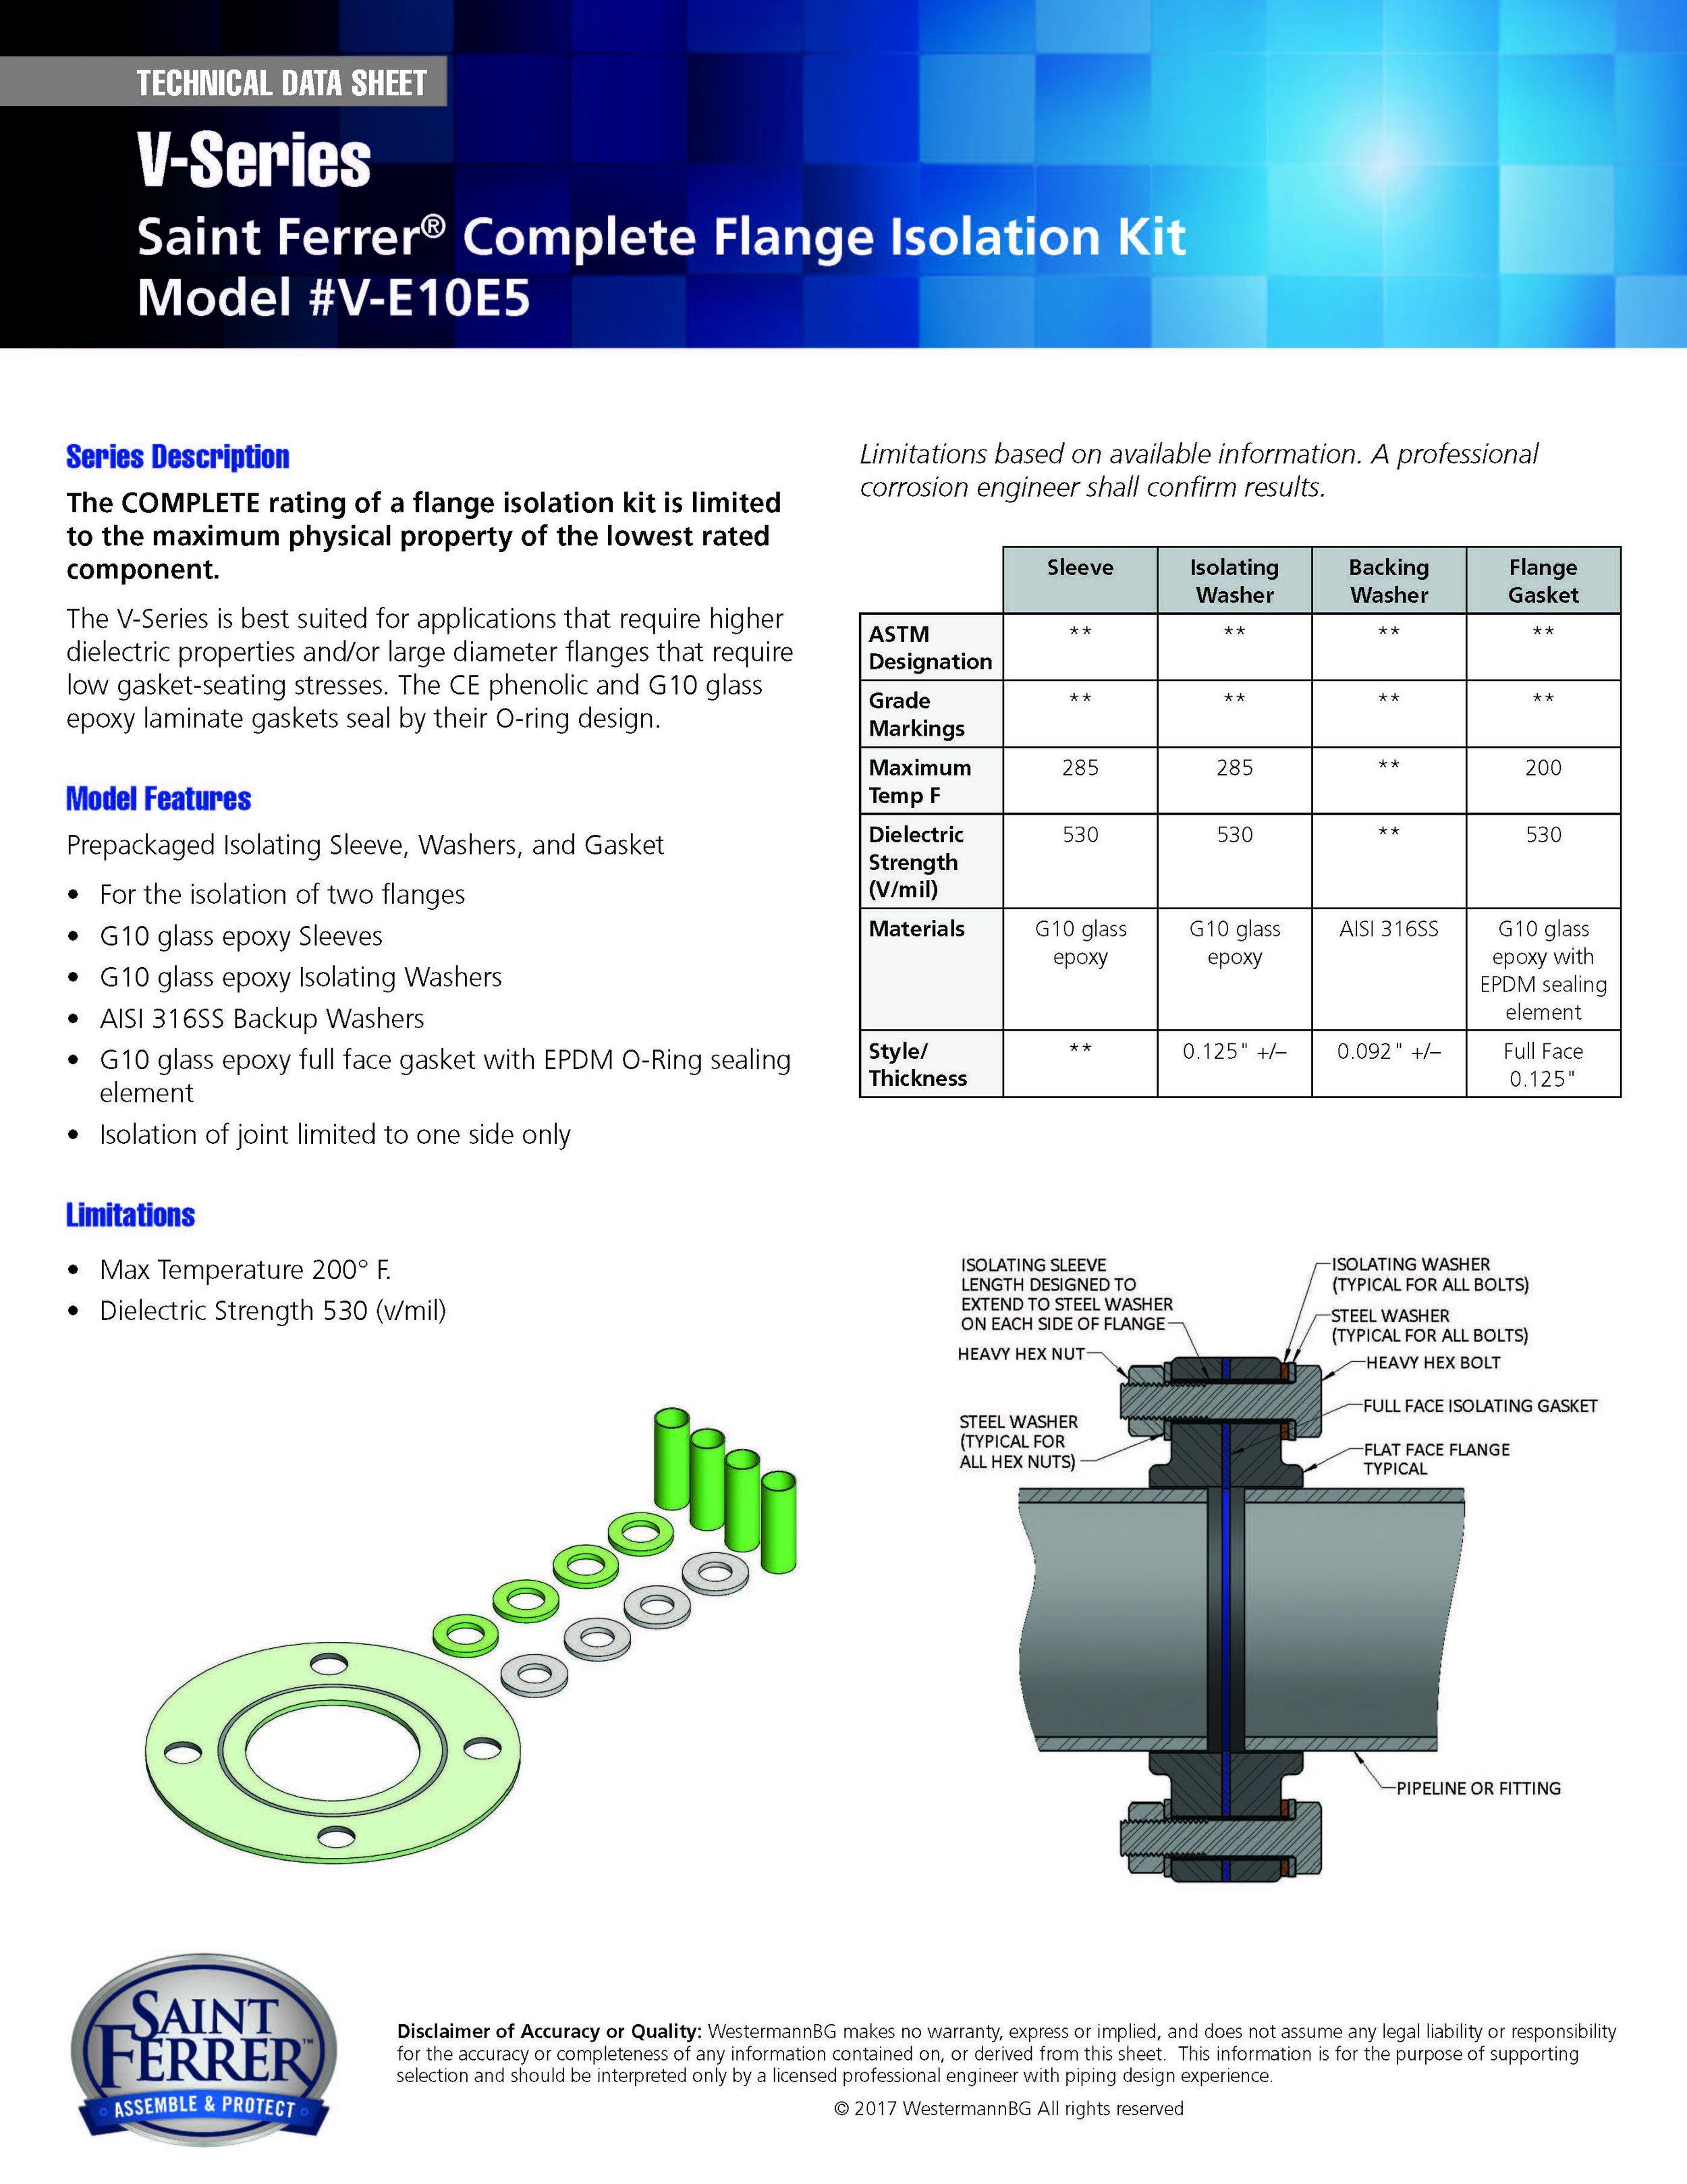 SF_Data_Sheet_V_Series_V-E10E5.jpg